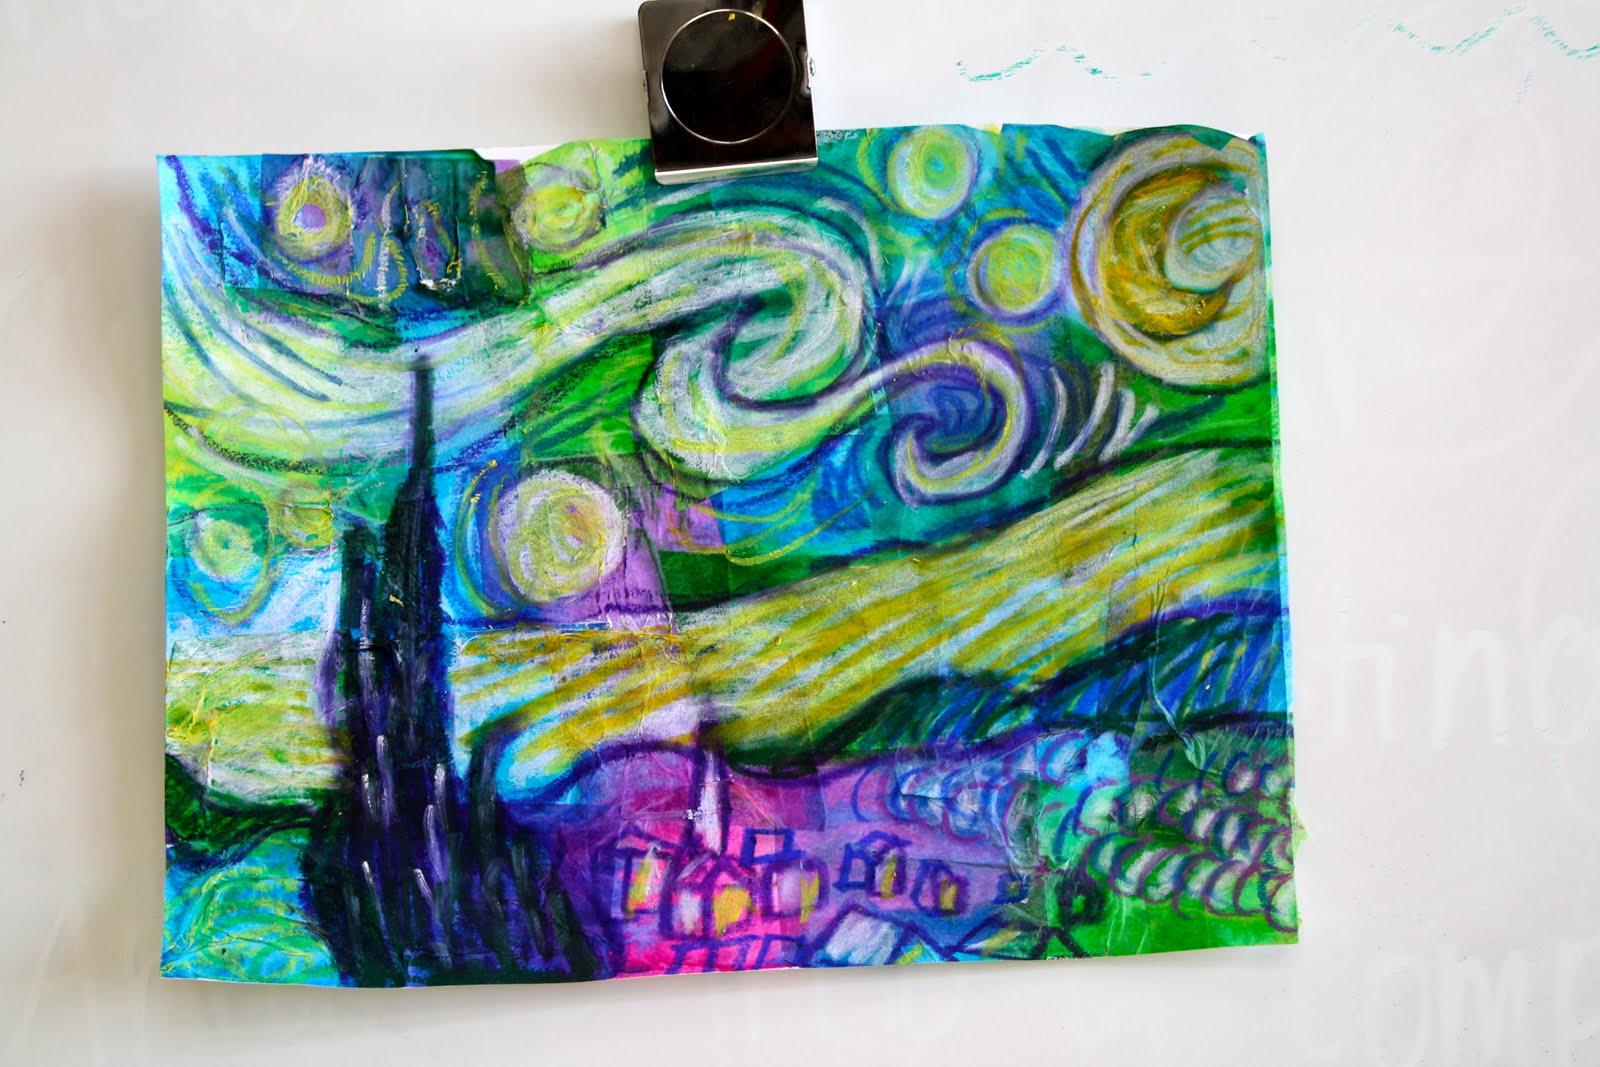 starry night essay dissertation help co uk review zu guttenberg dissertation pdf dankworth dissertation abstract internship reflection paper introduction to arts color scheme essay vincent van gogh